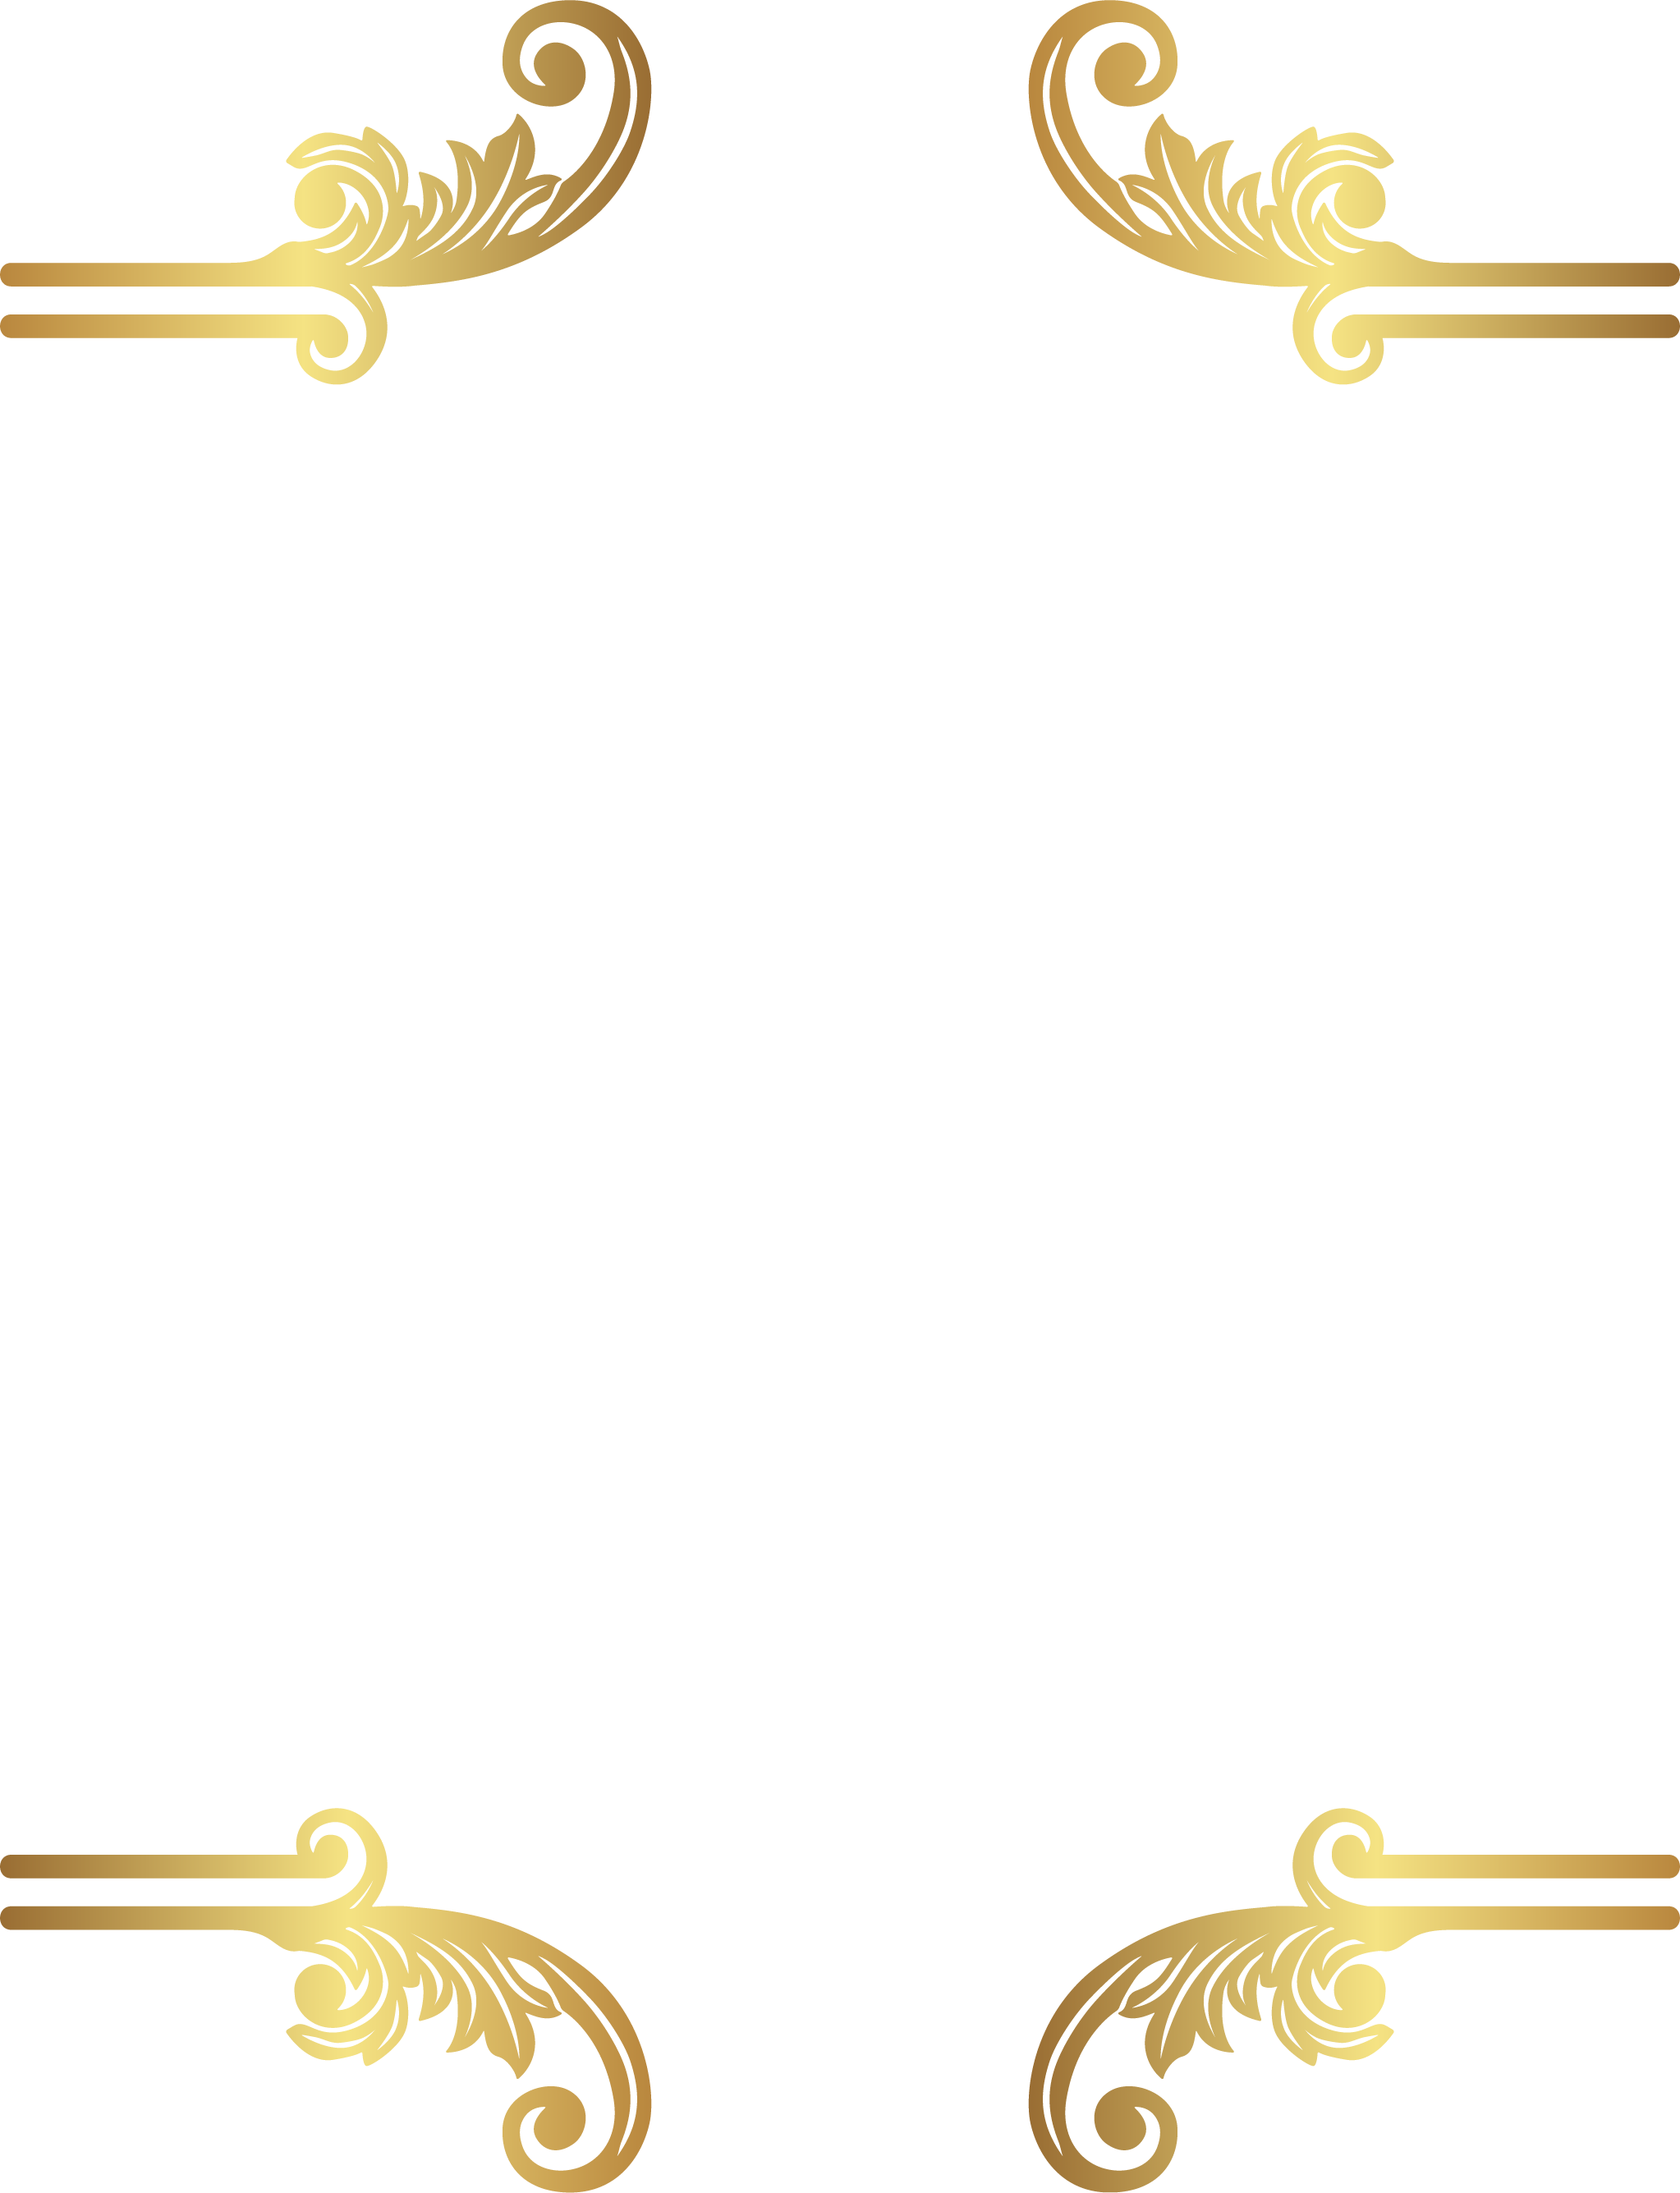 Clipart borderwith transparent background jpg transparent HD Decorative Border Clipart Png Image - Gold Borders With ... jpg transparent